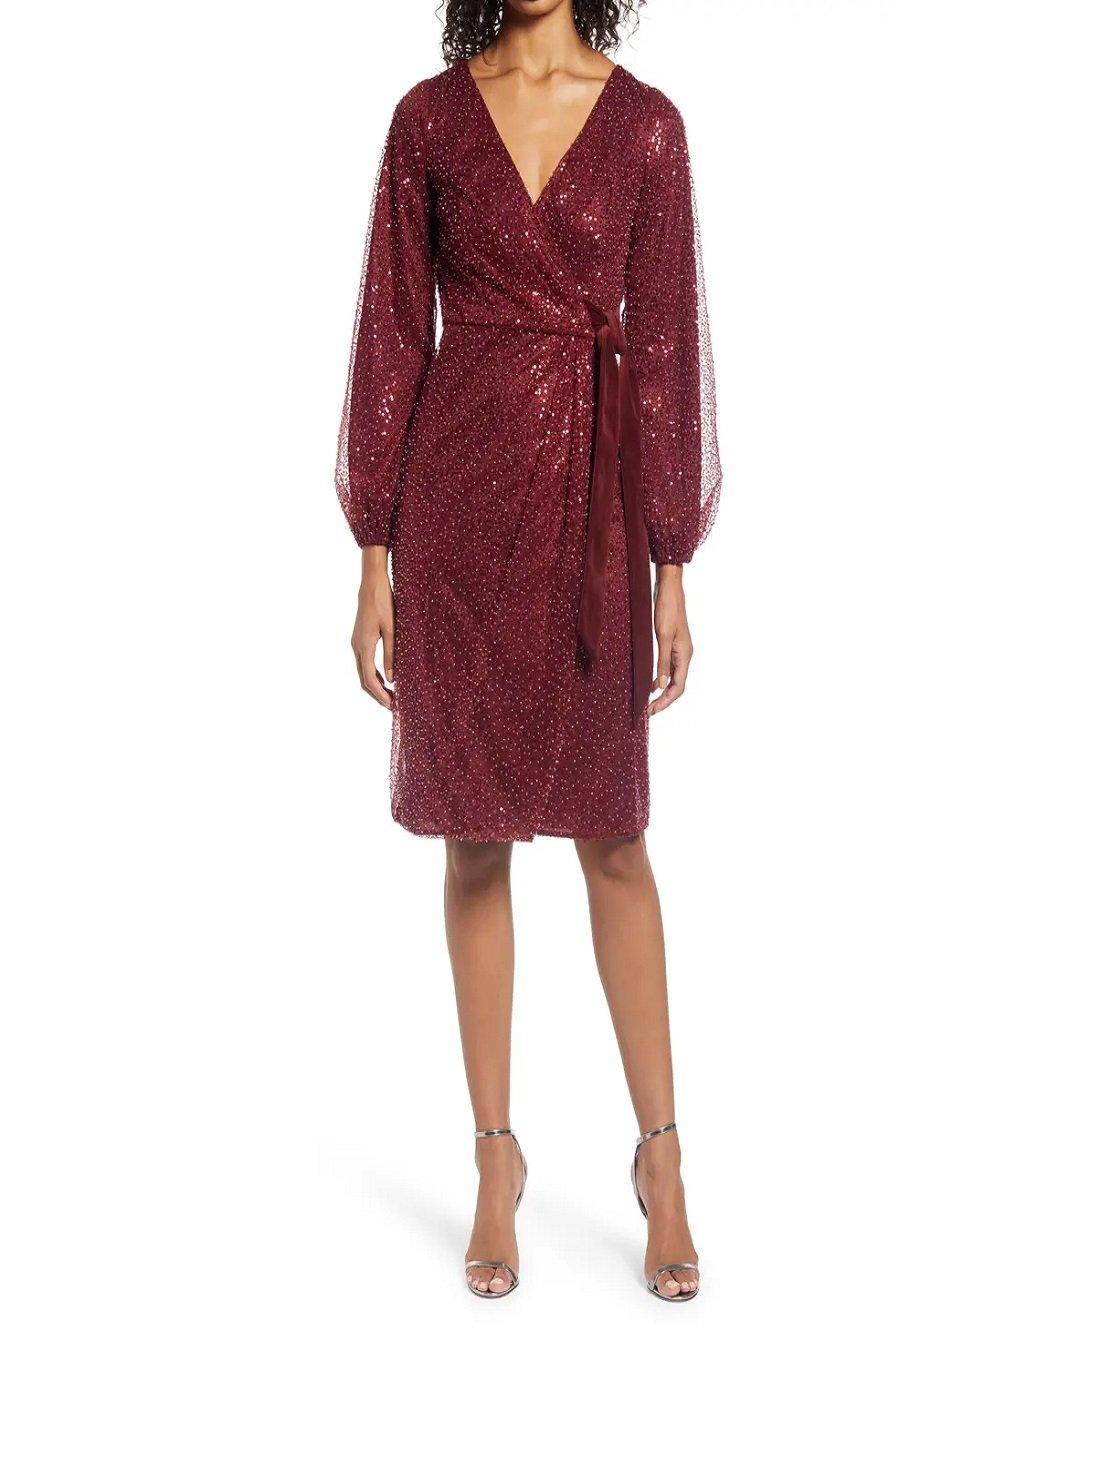 Beaded Long Sleeve Faux Wrap Dress